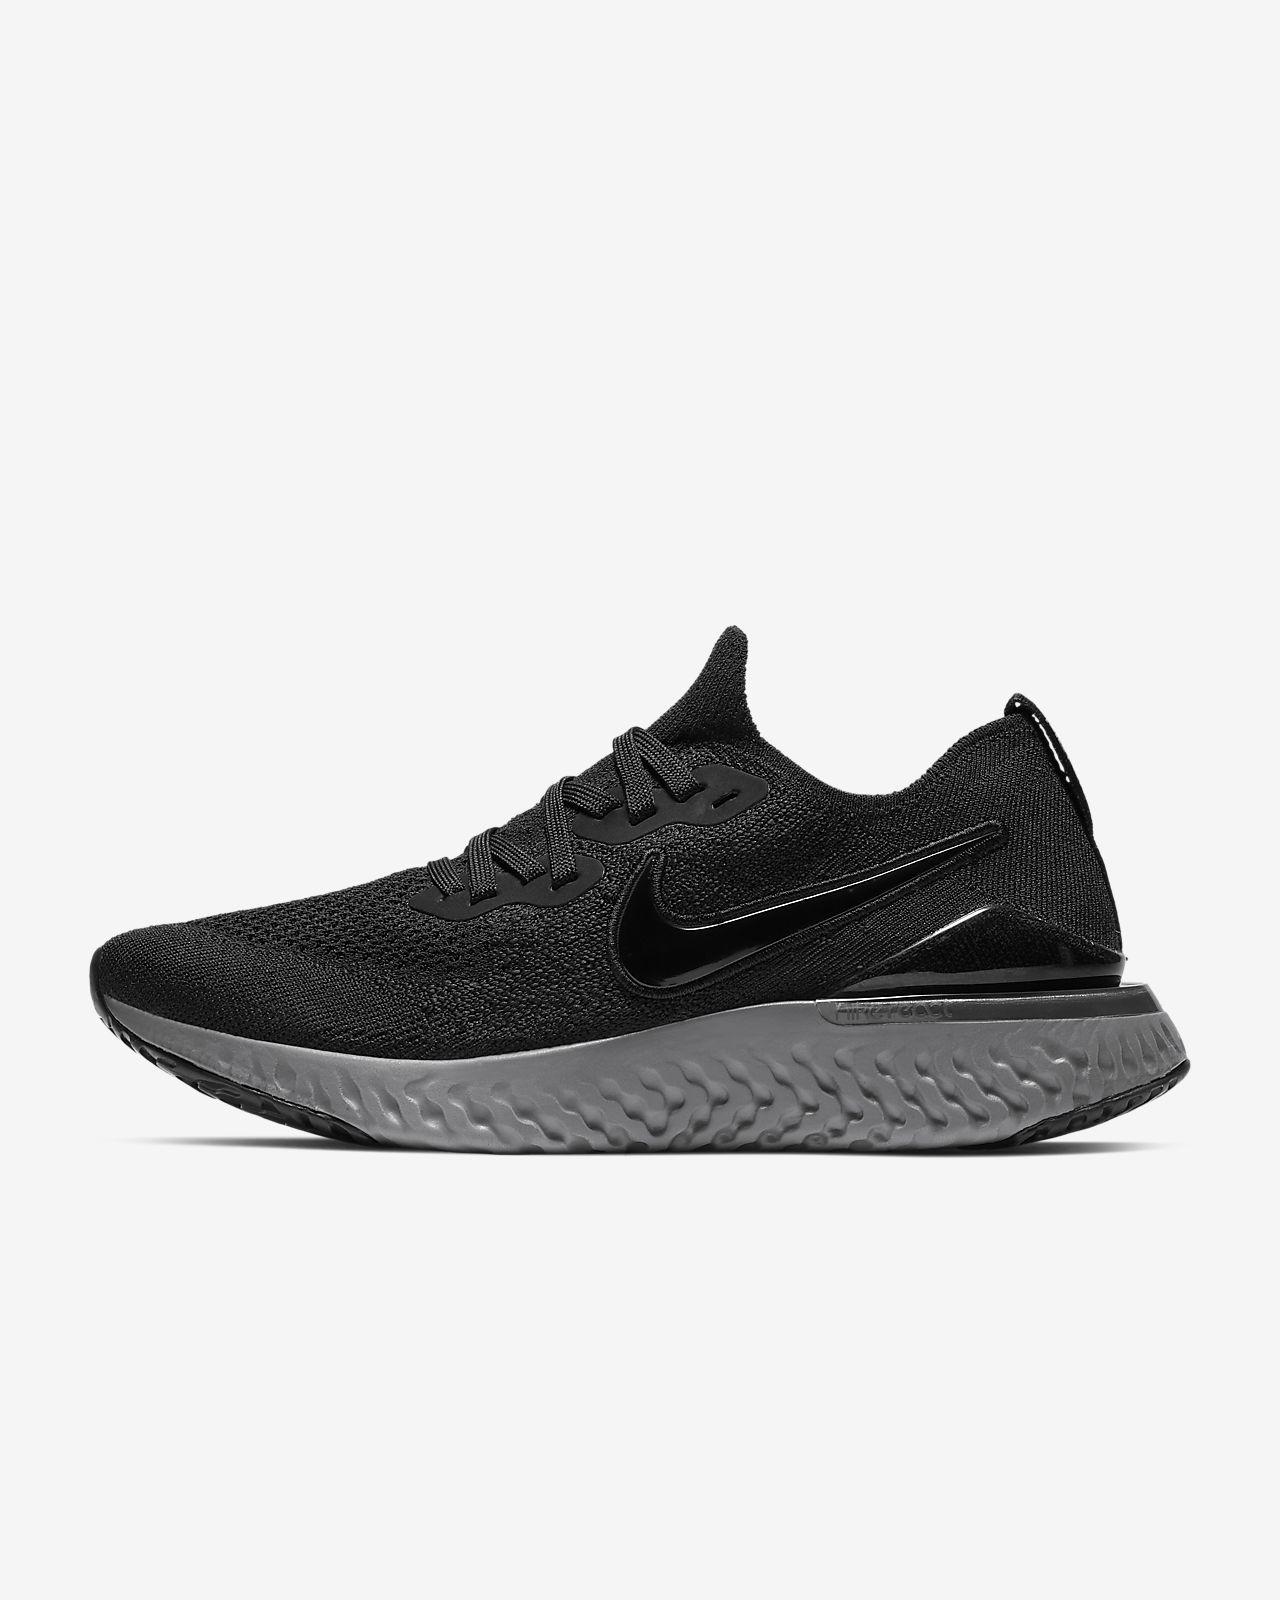 87d97 32217  ebay calzado de running para mujer nike epic react flyknit 2  930f4 9bf07 dea597f6ff9bb